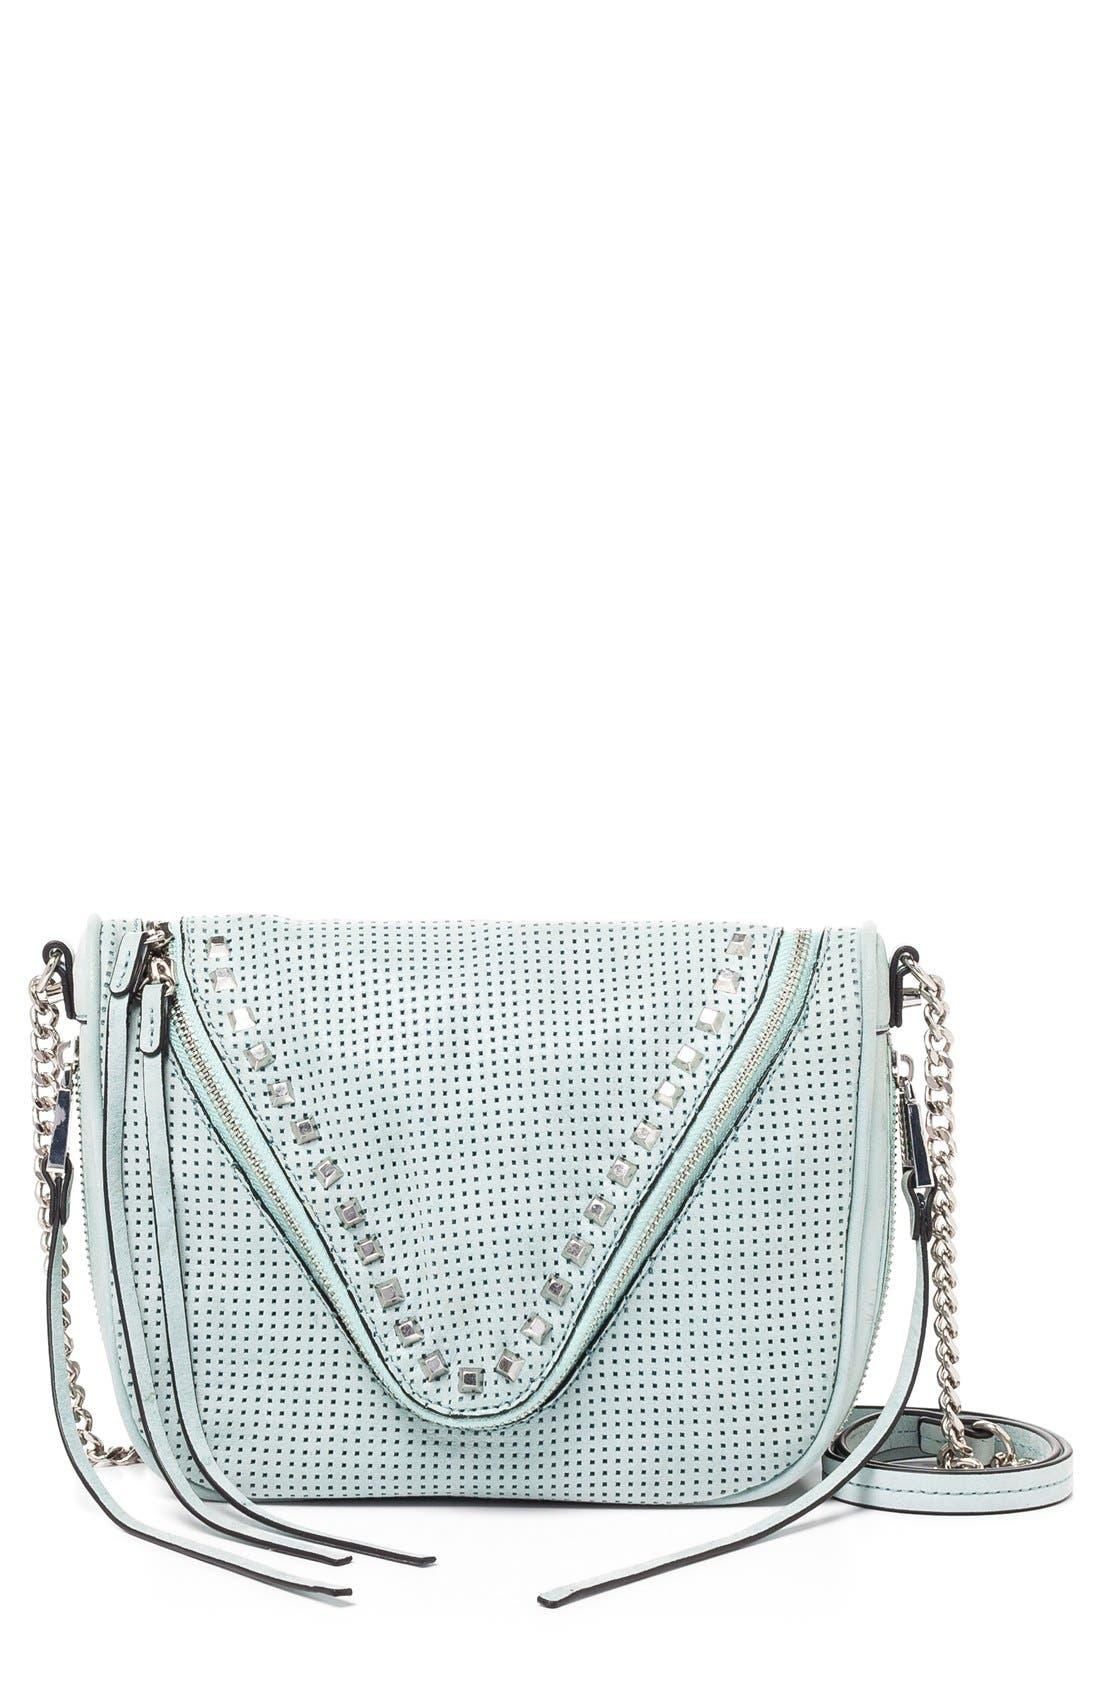 Main Image - She + Lo 'Make Your Mark' Leather Crossbody Bag